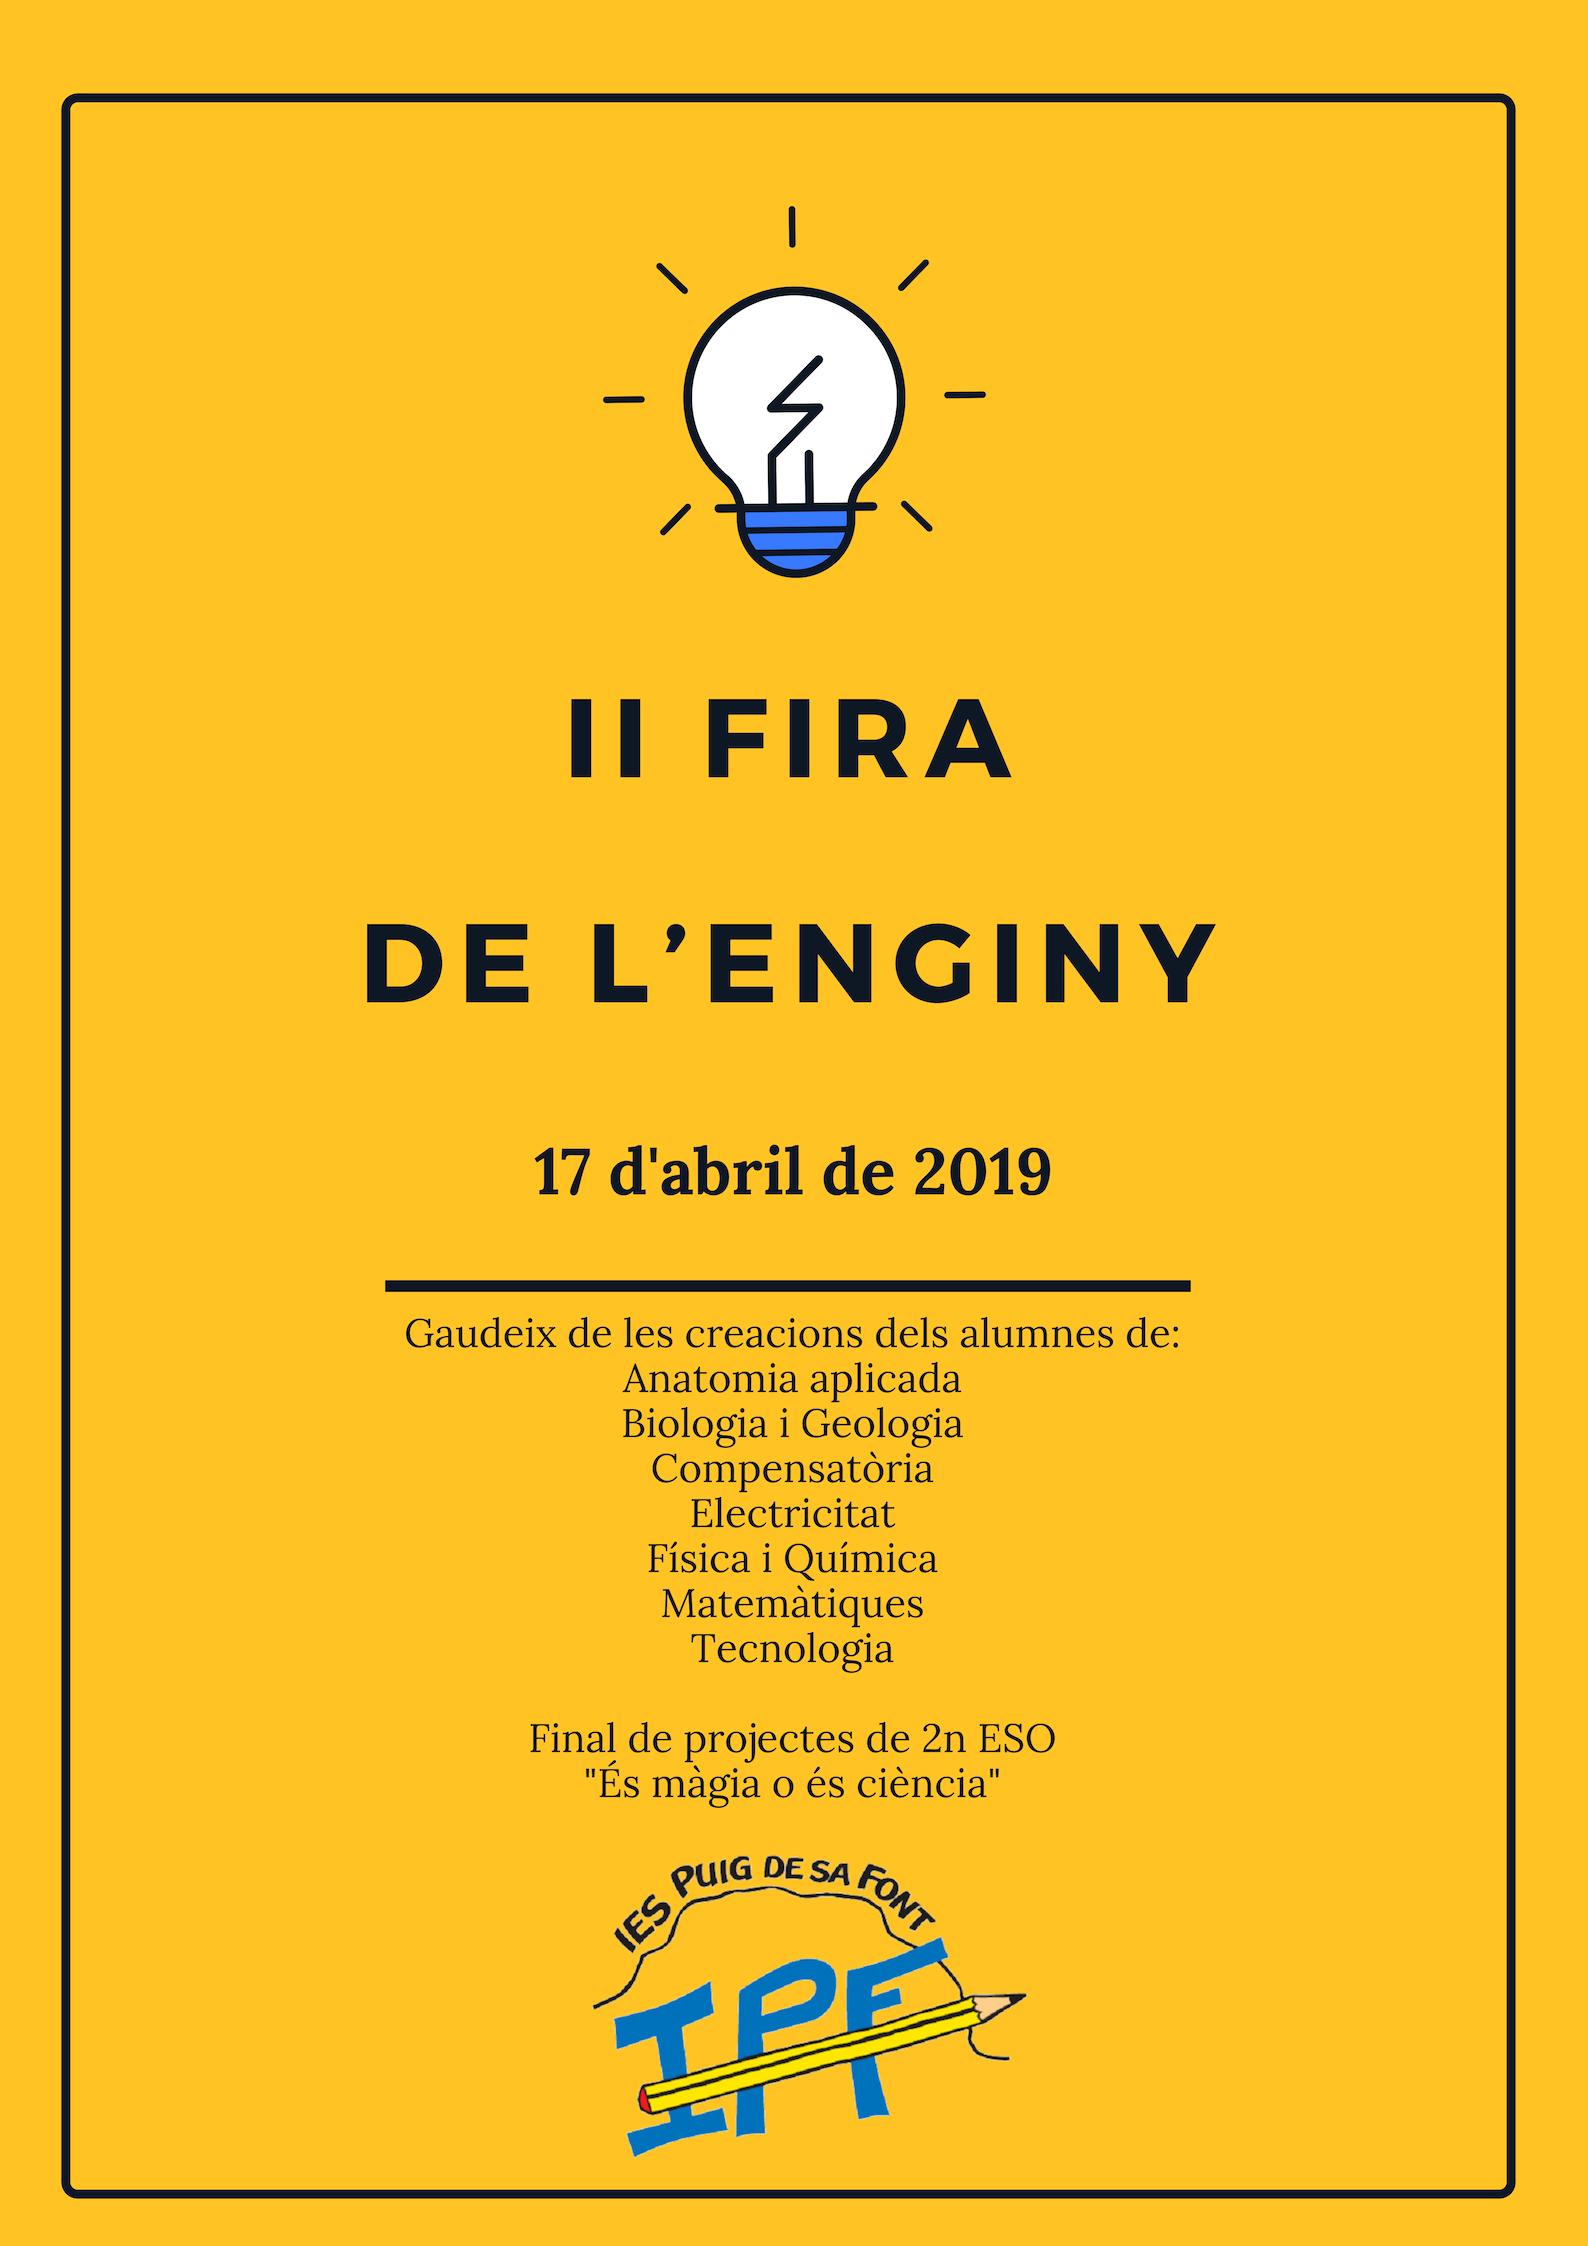 II FIRA DE L'ENGINY